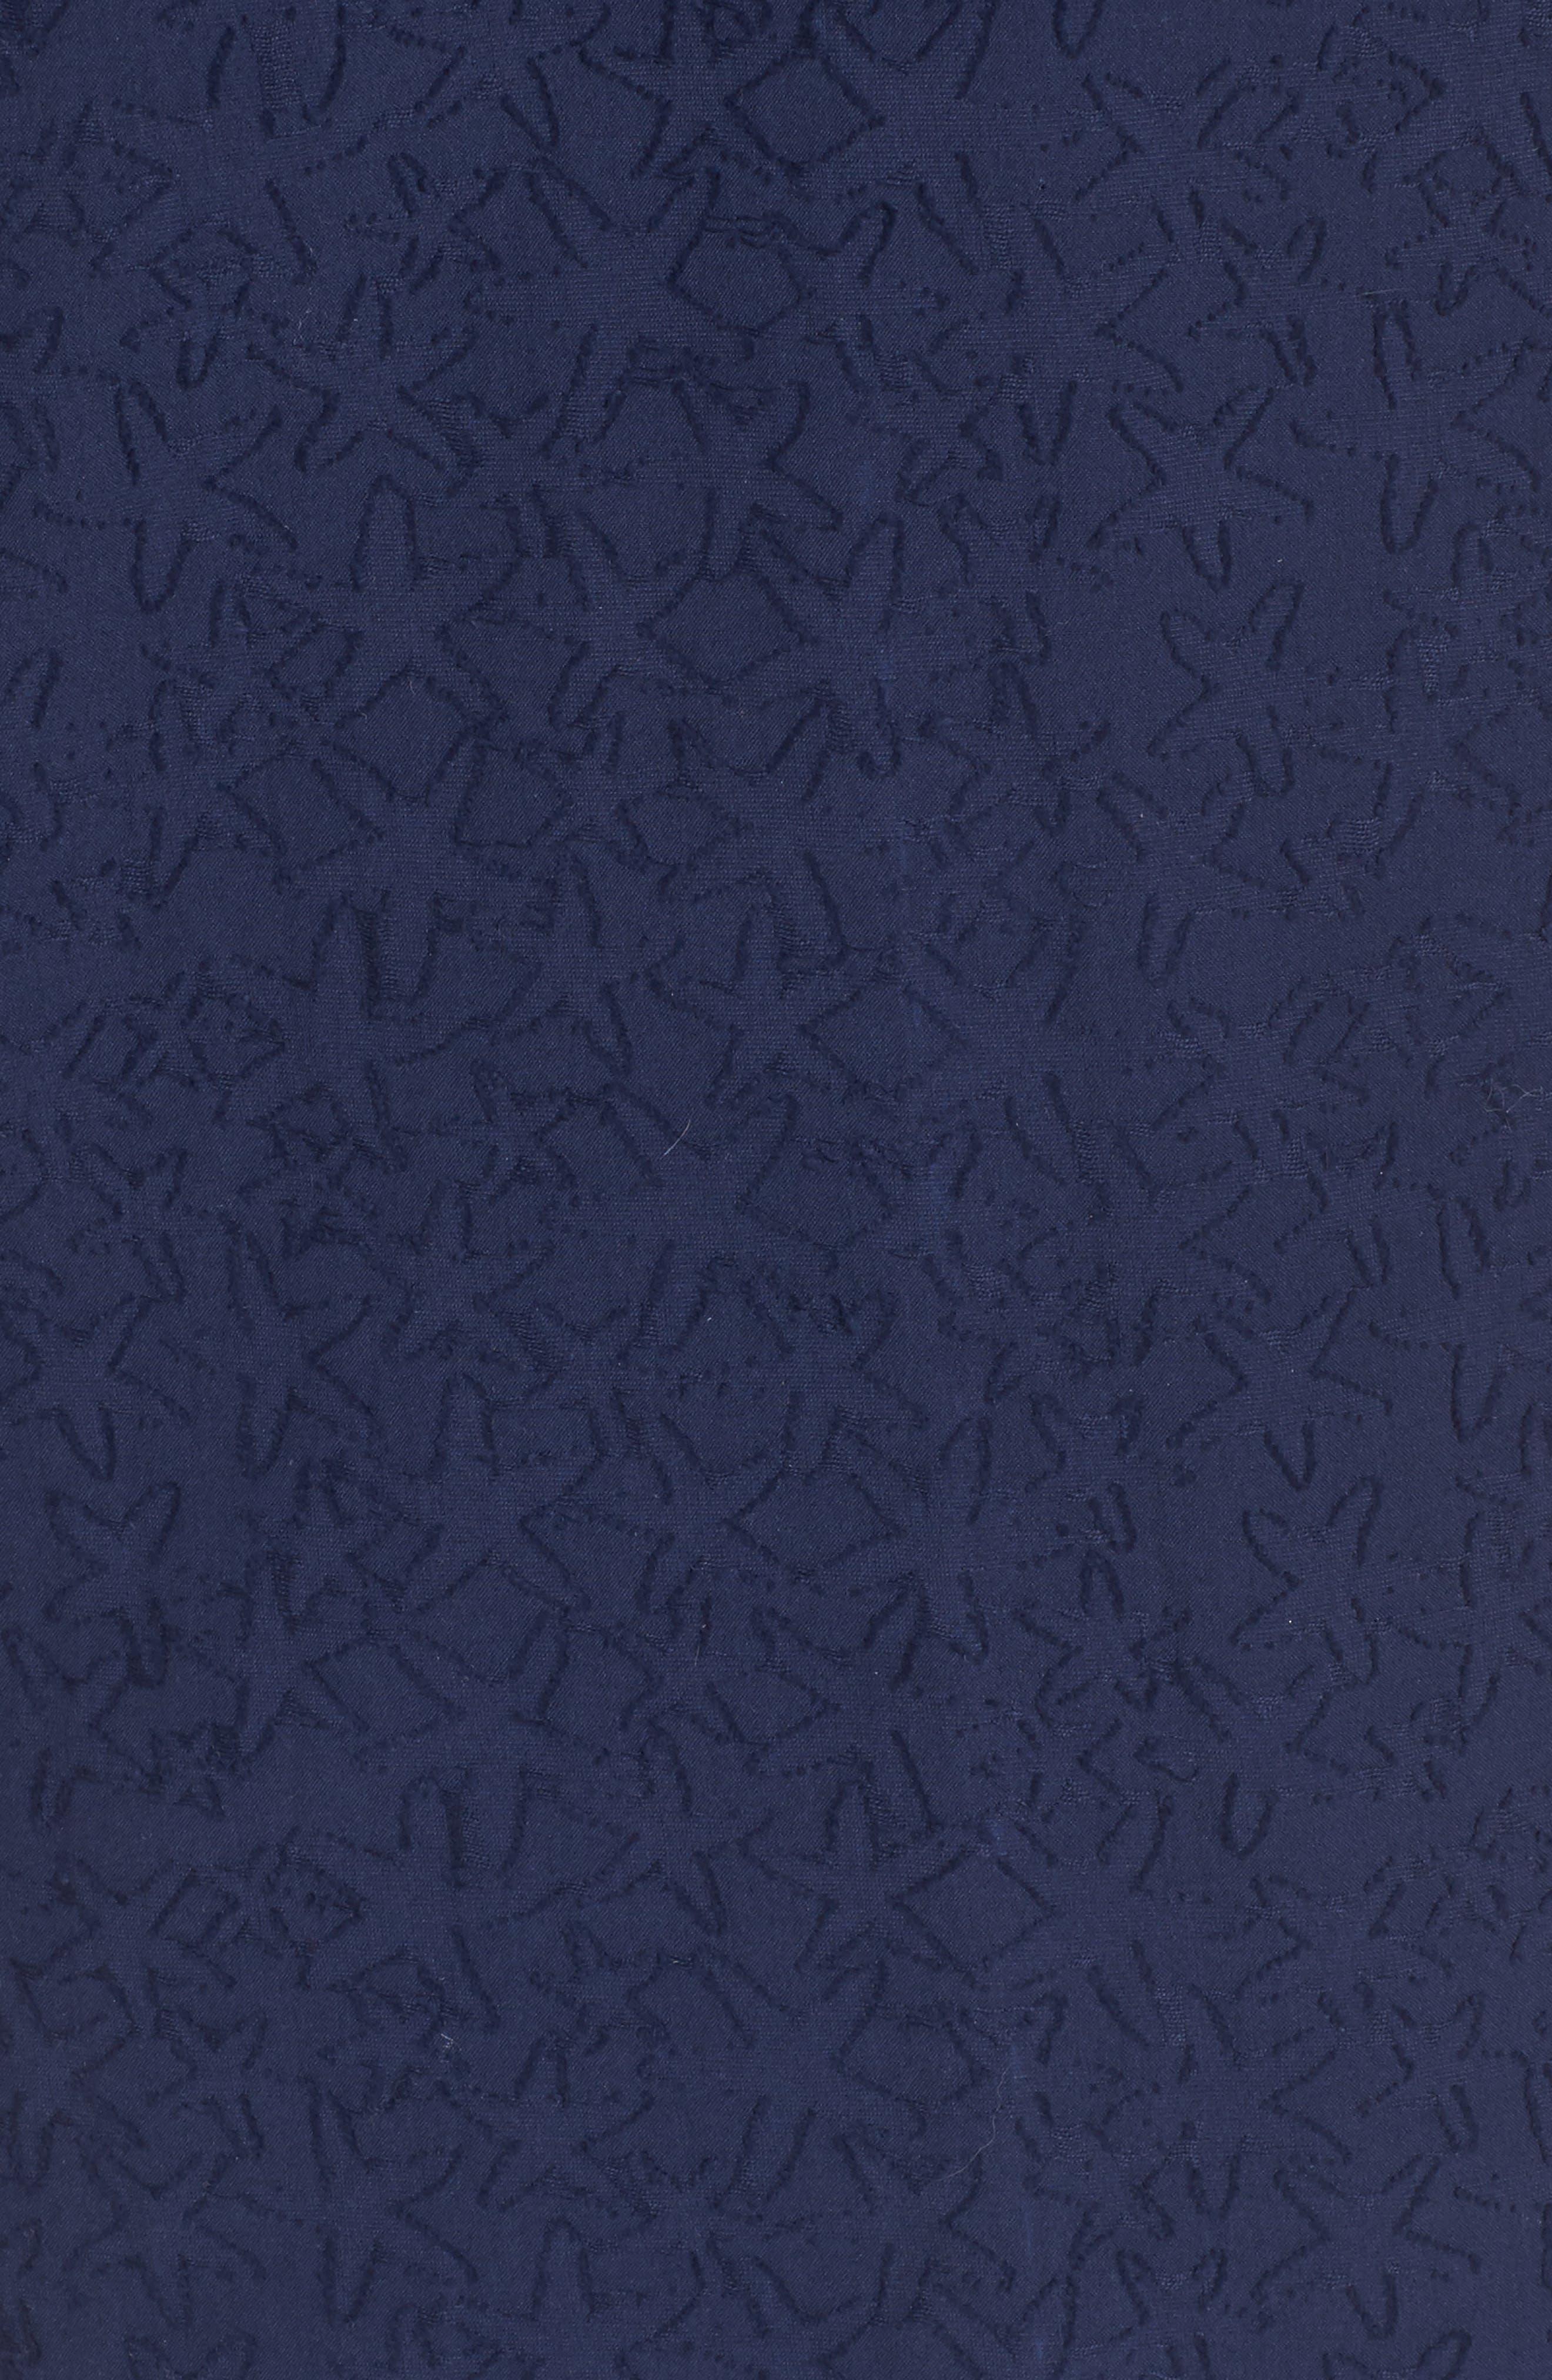 Starfish Burnout Tunic Dress,                             Alternate thumbnail 5, color,                             Deep Bay